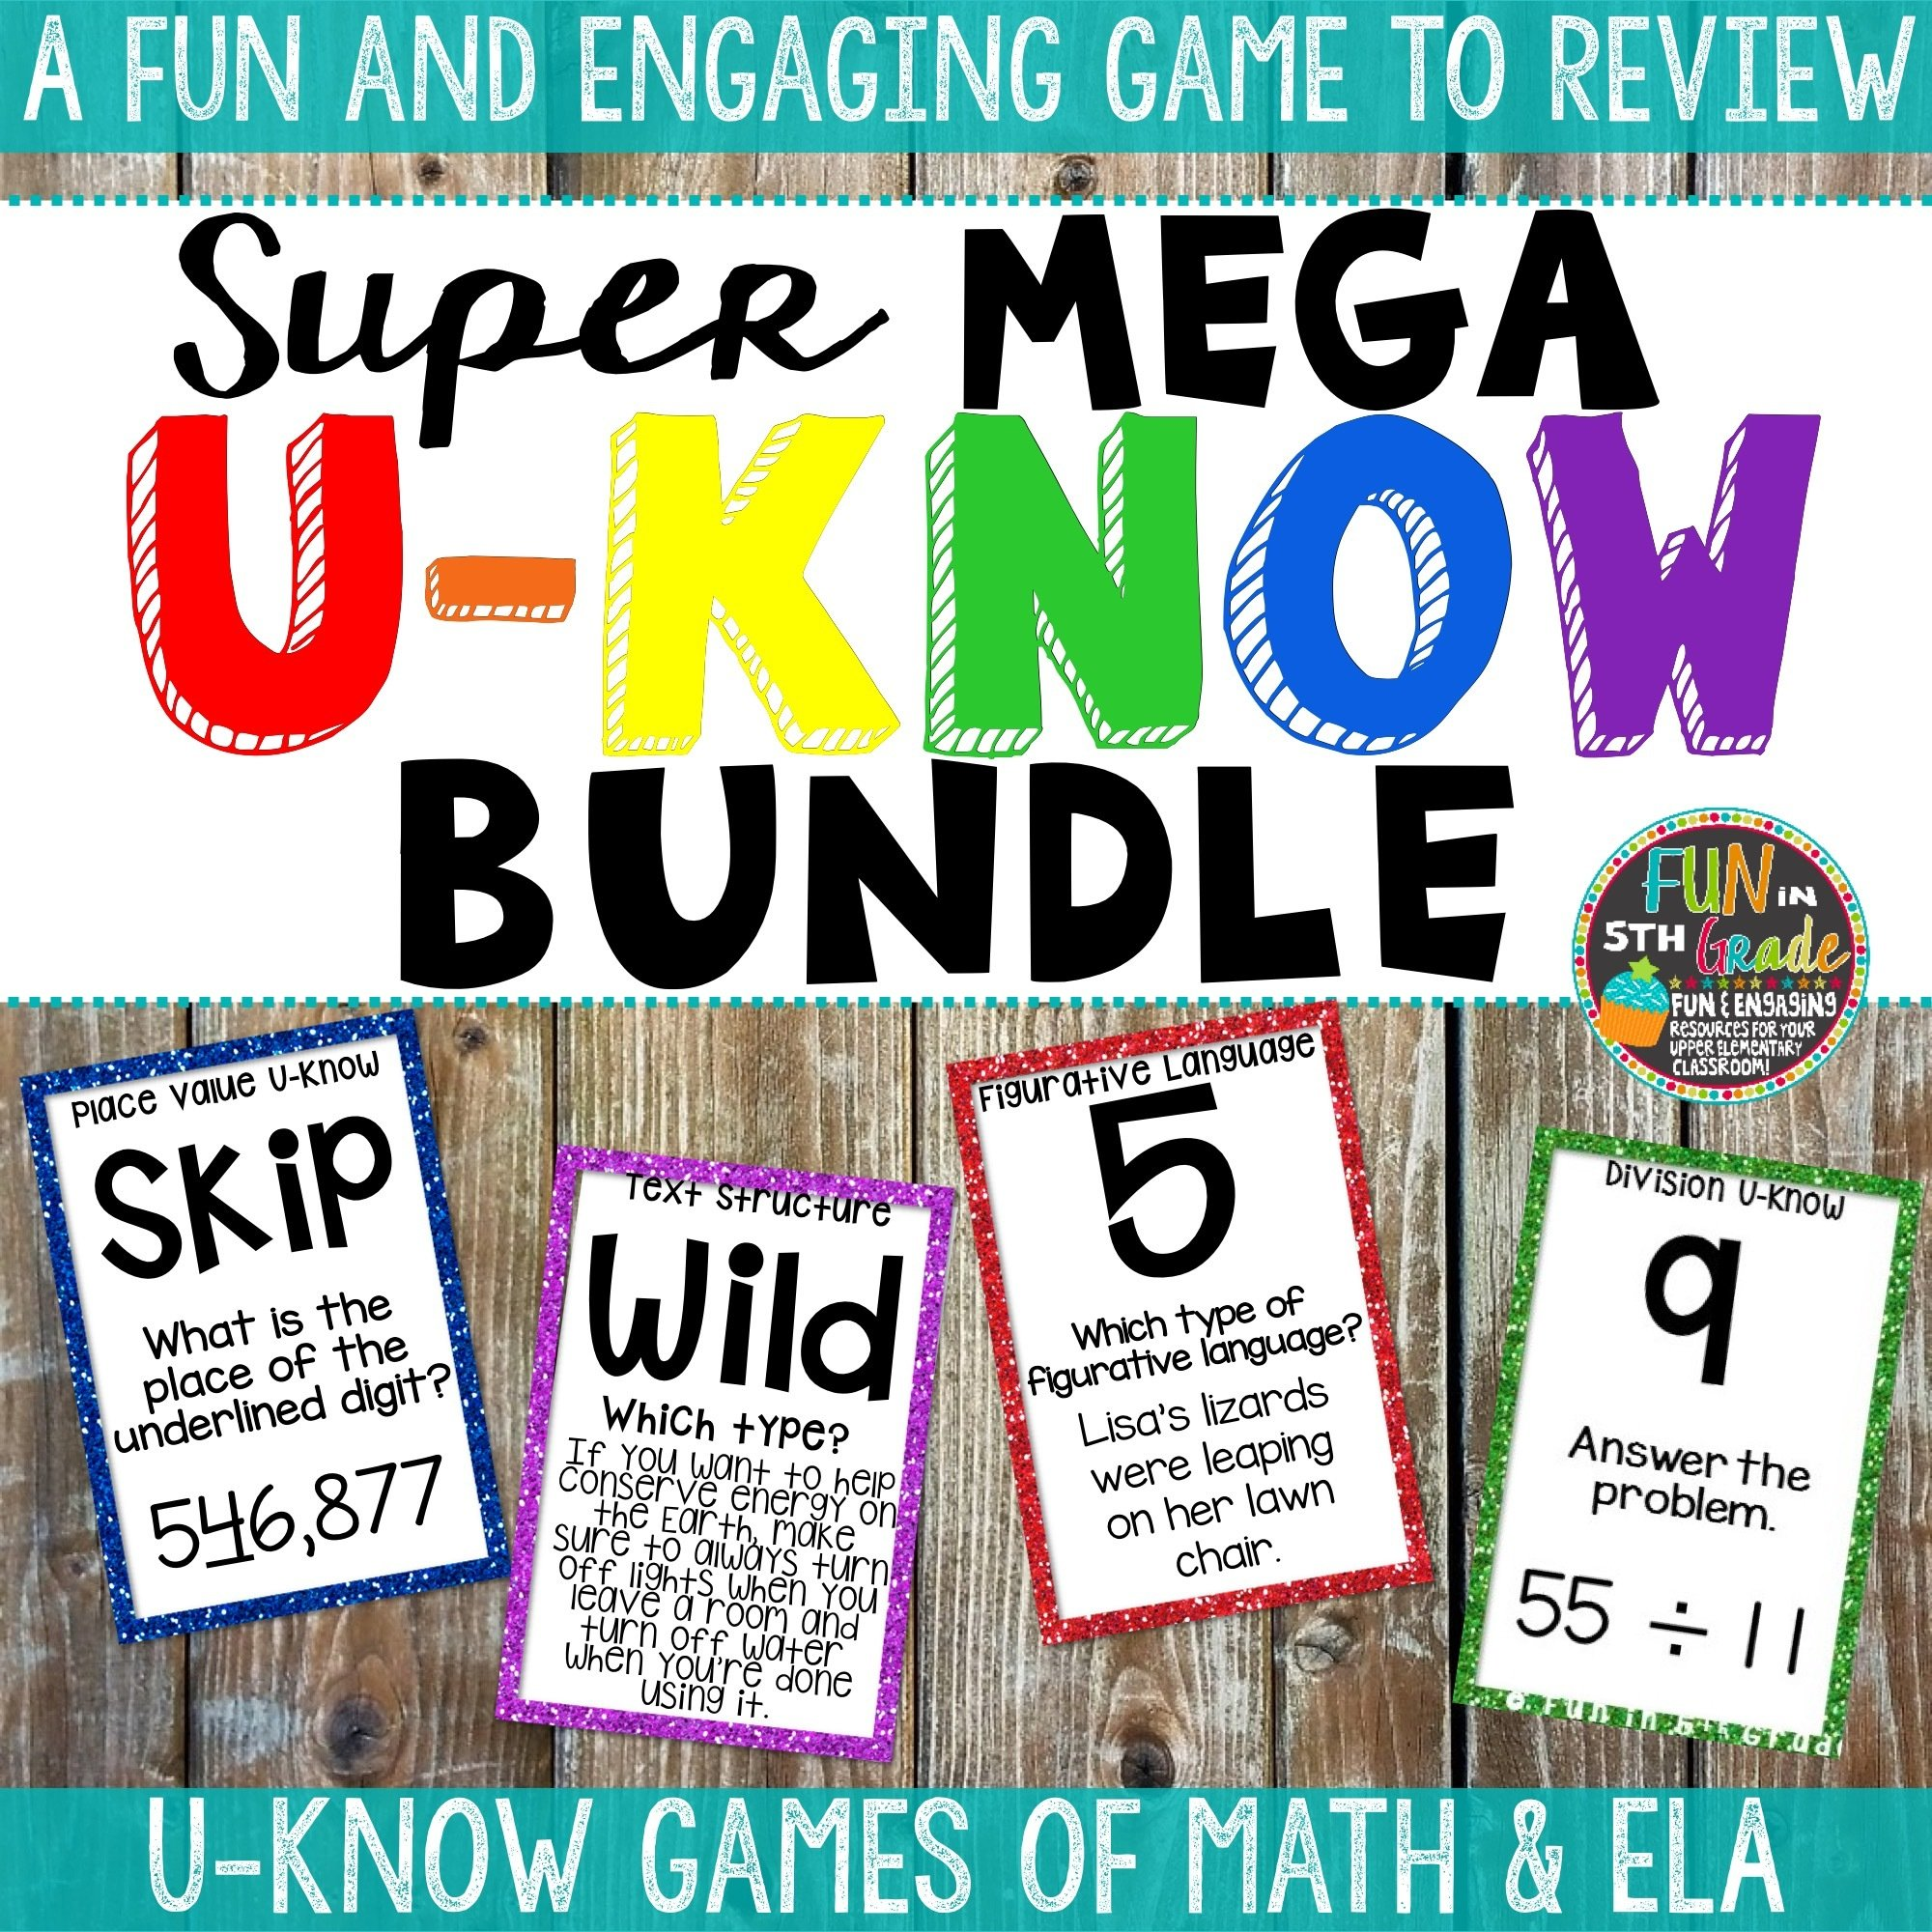 Math & ELA U-Know Super Mega Bundle 00046